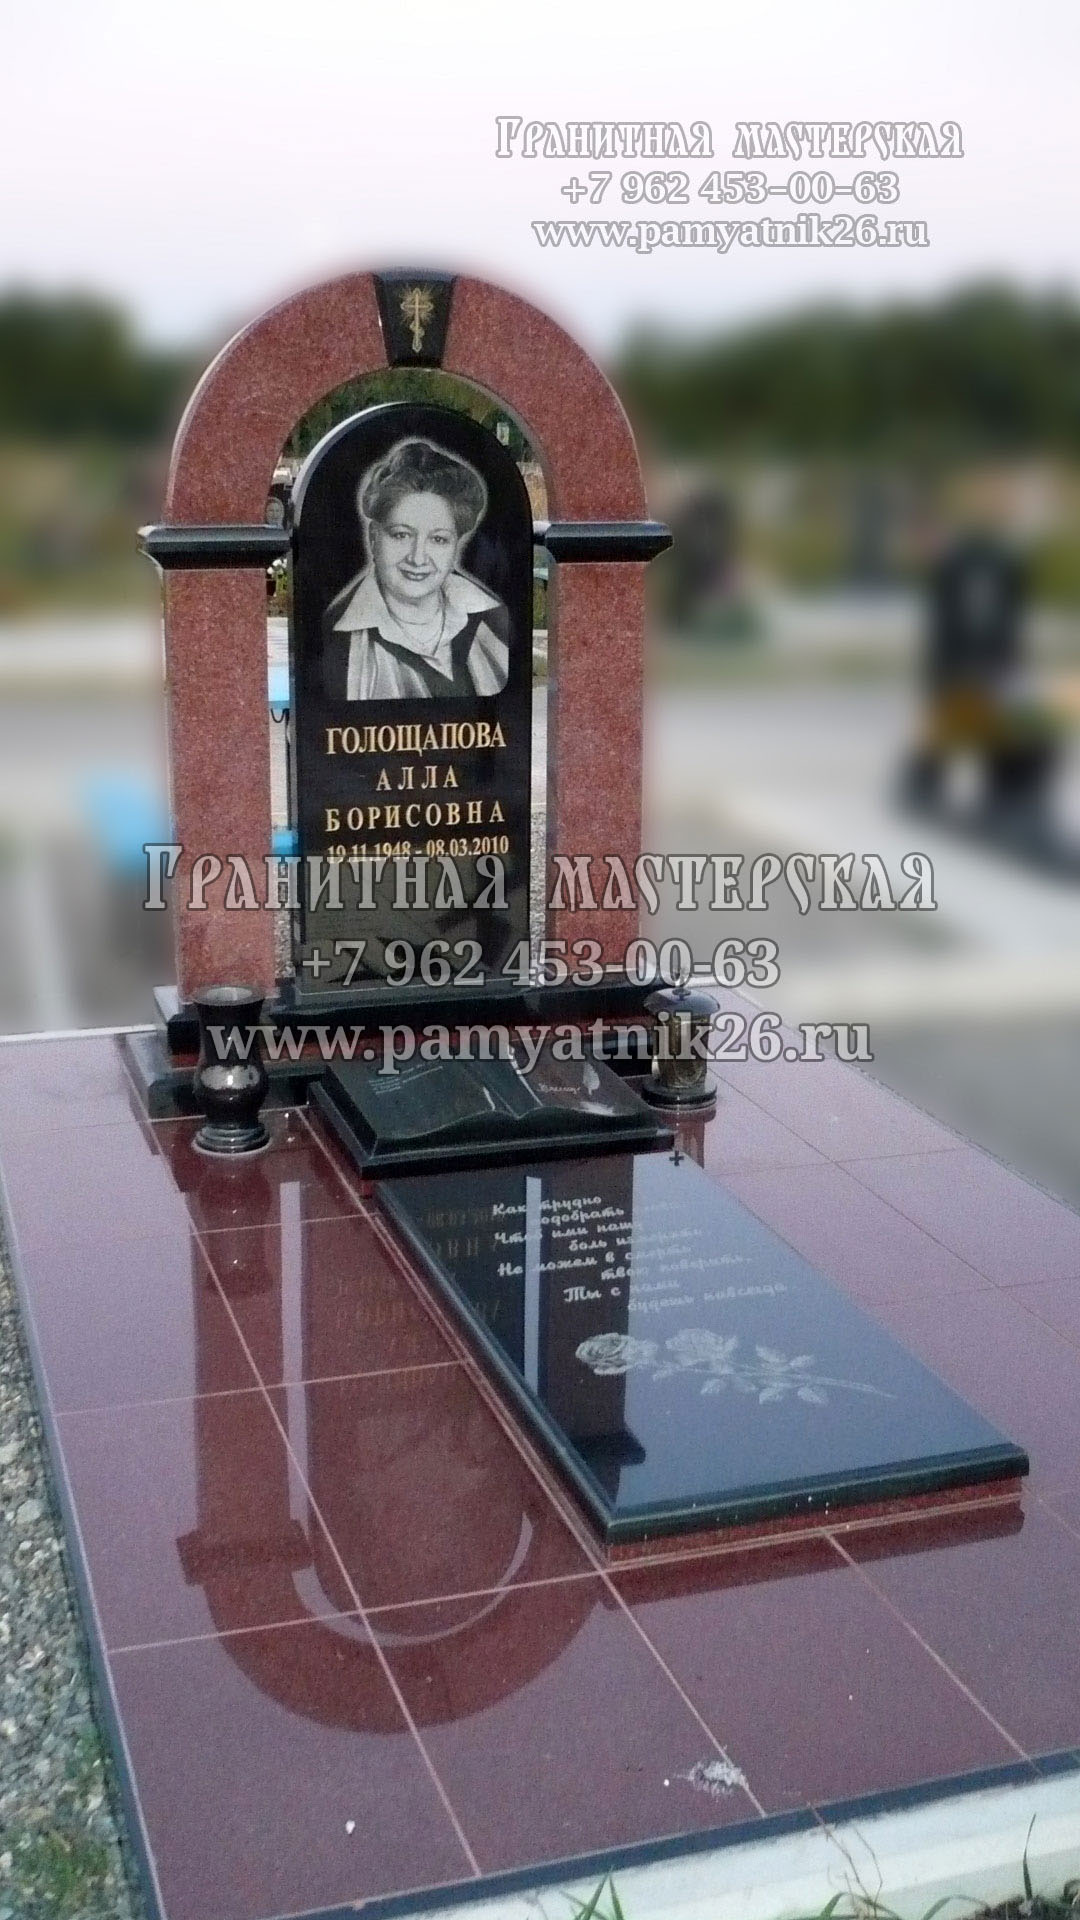 Памятники из гранита каталог цены ставрополь цена на памятники самары а